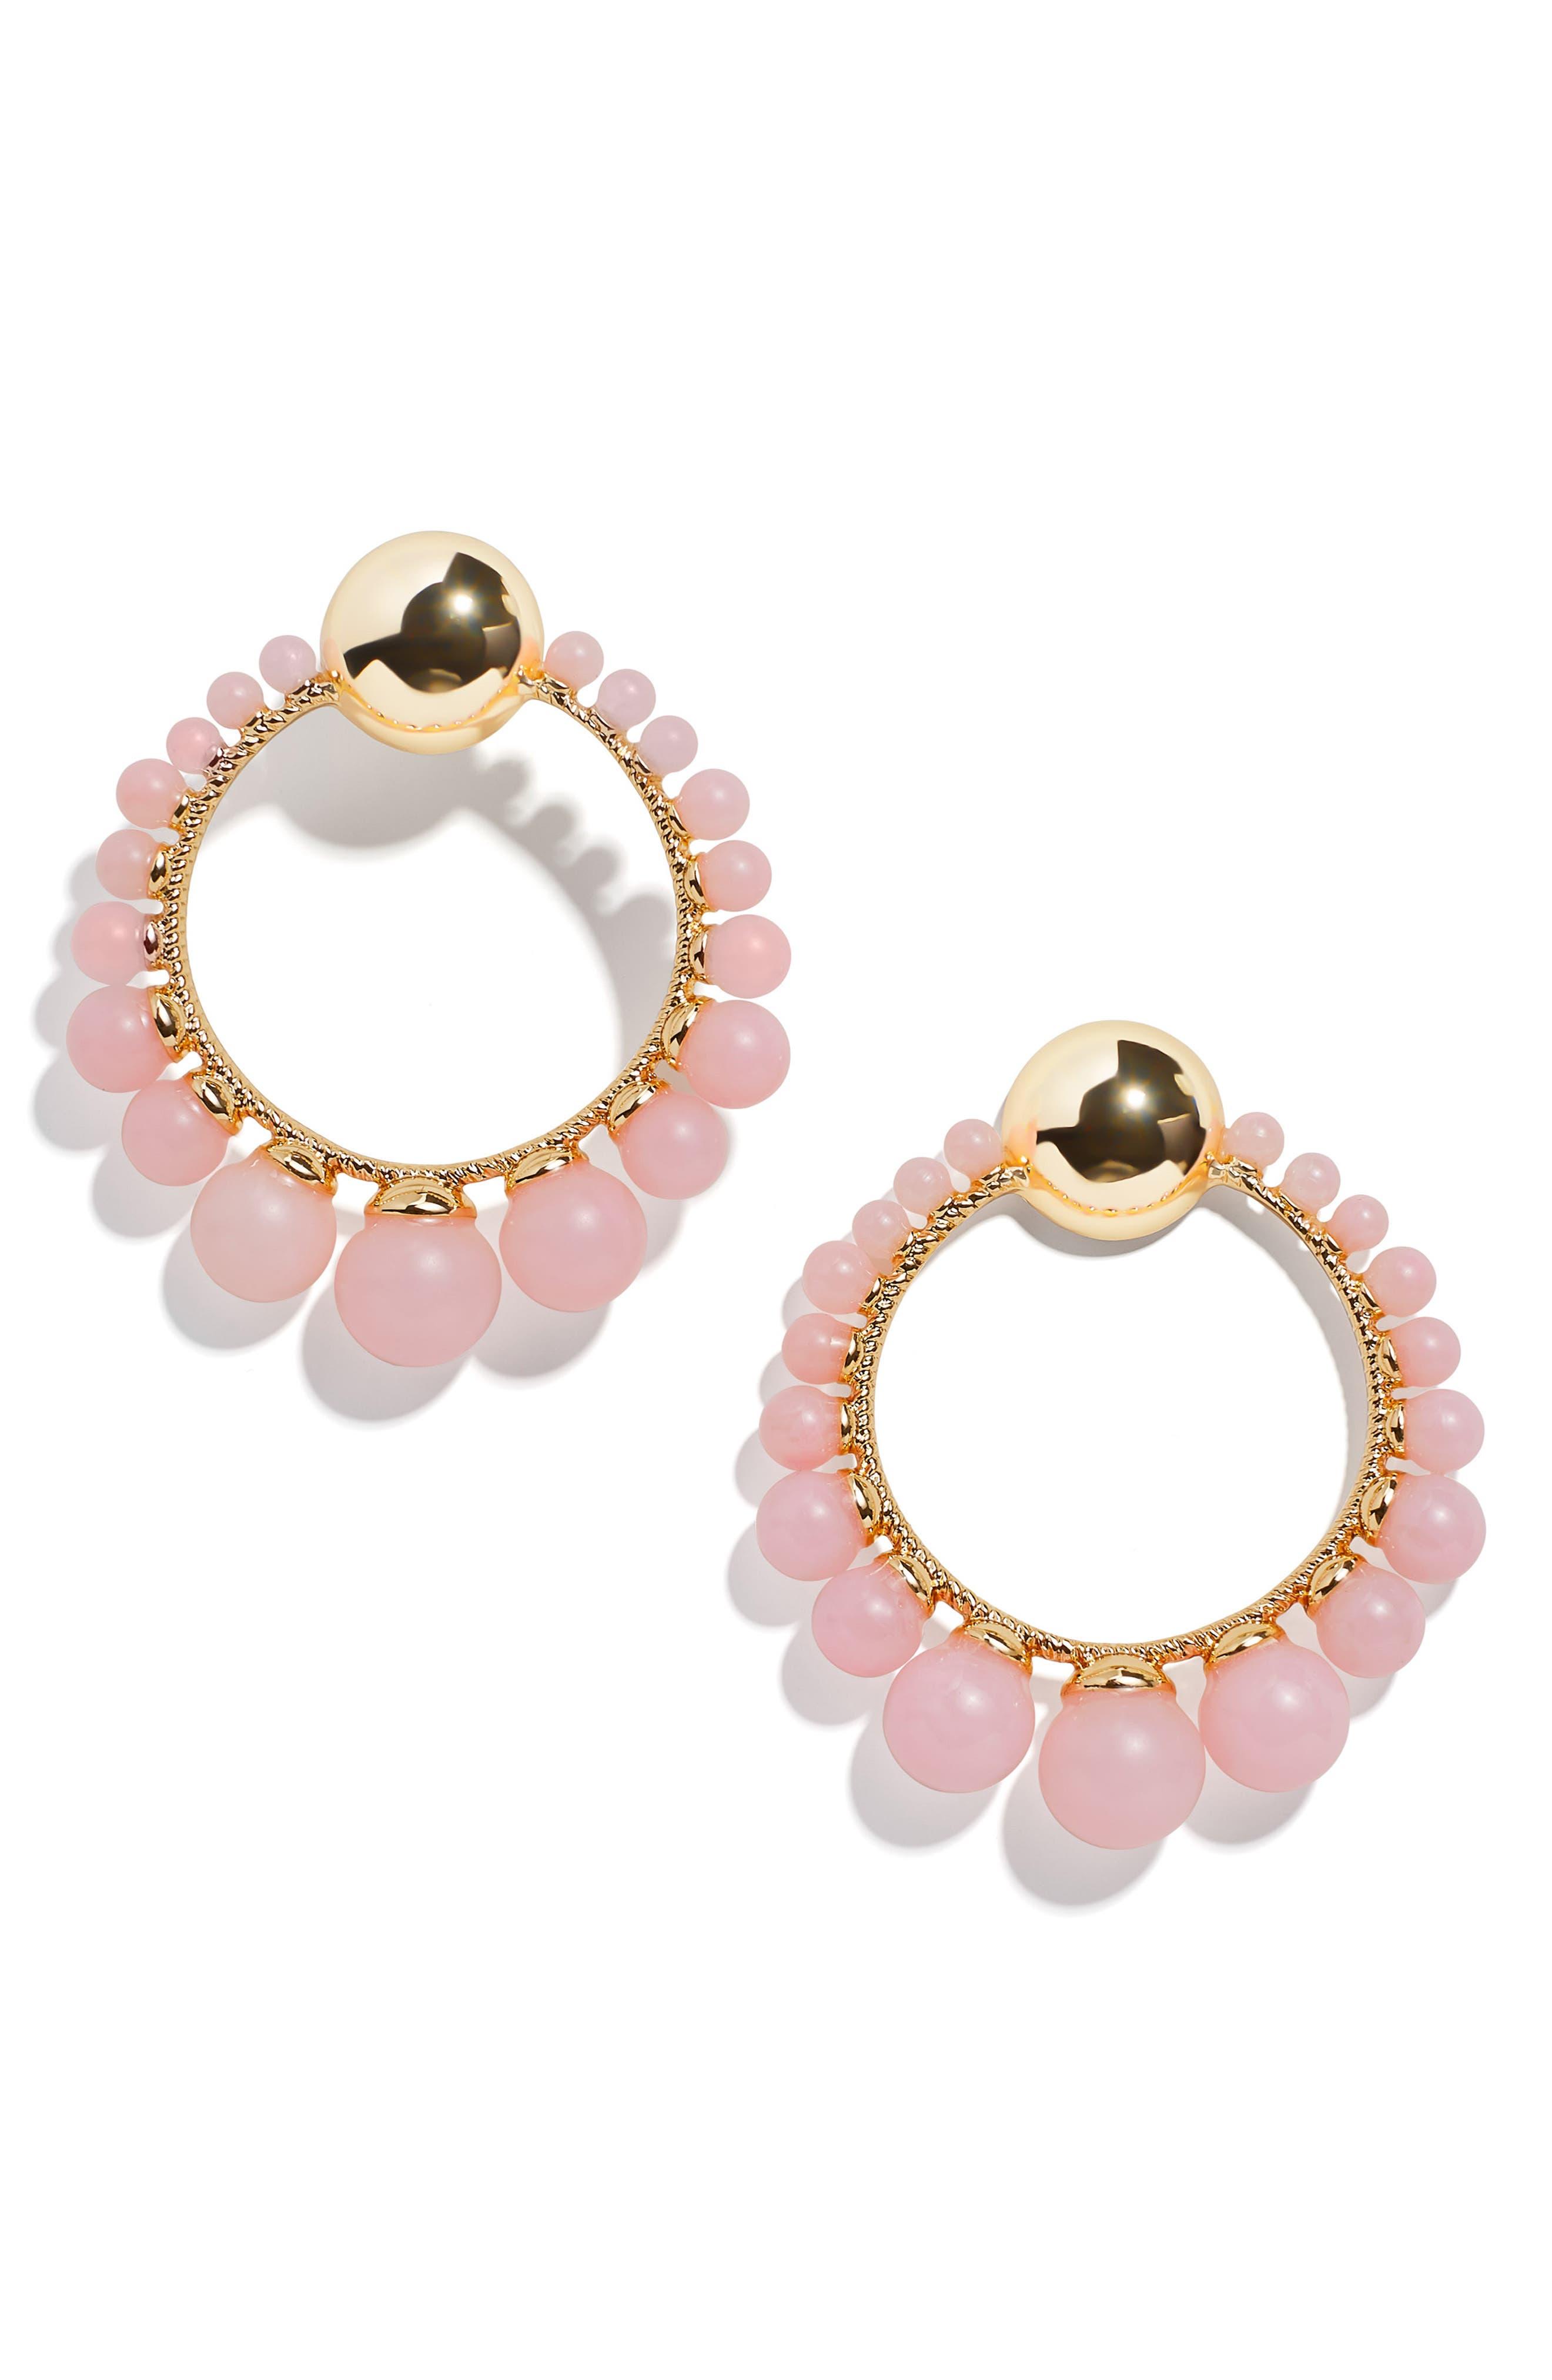 Image of BAUBLEBAR Beaded Open Circle Drop Earrings